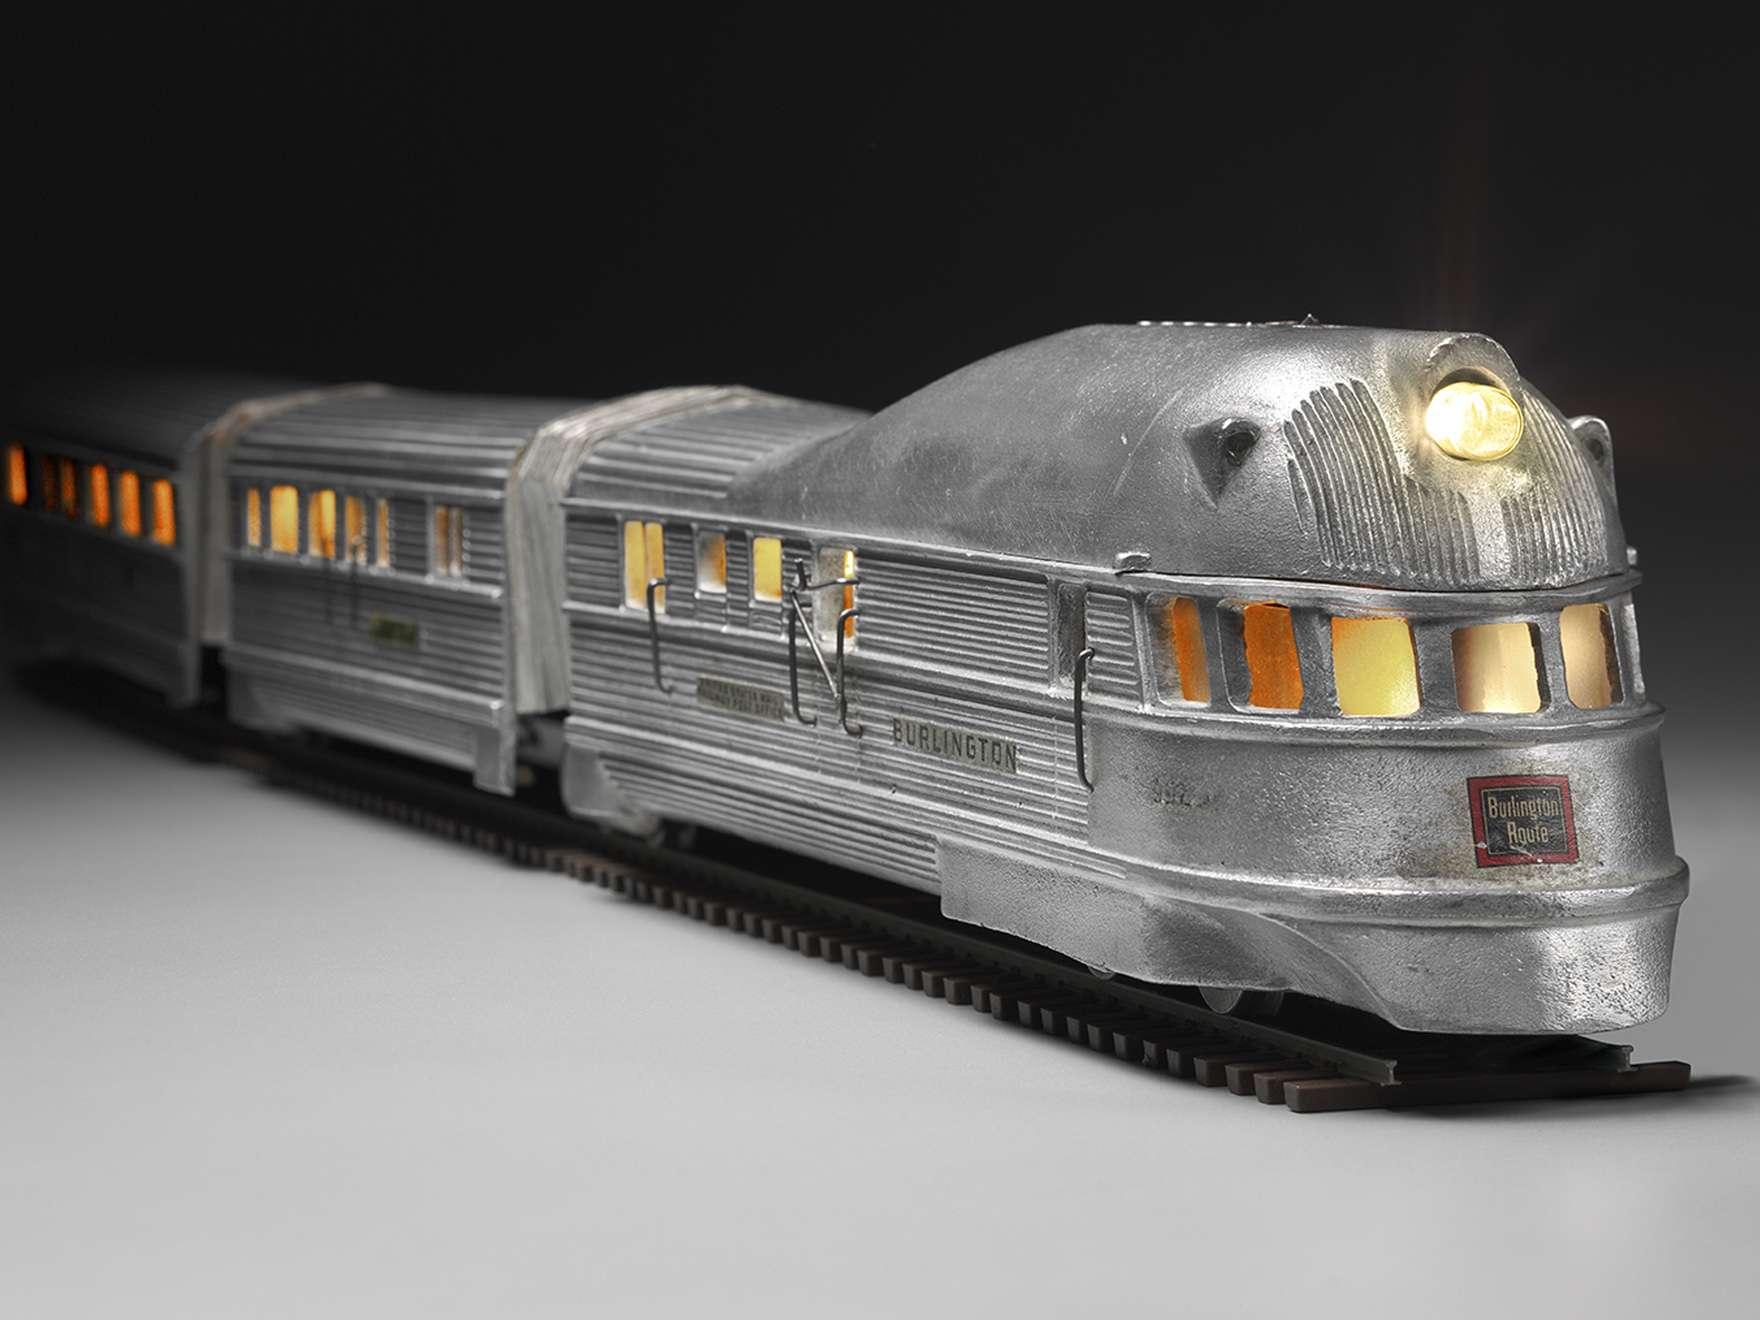 Planes Trains And Automobiles Museum Of Fine Arts Boston